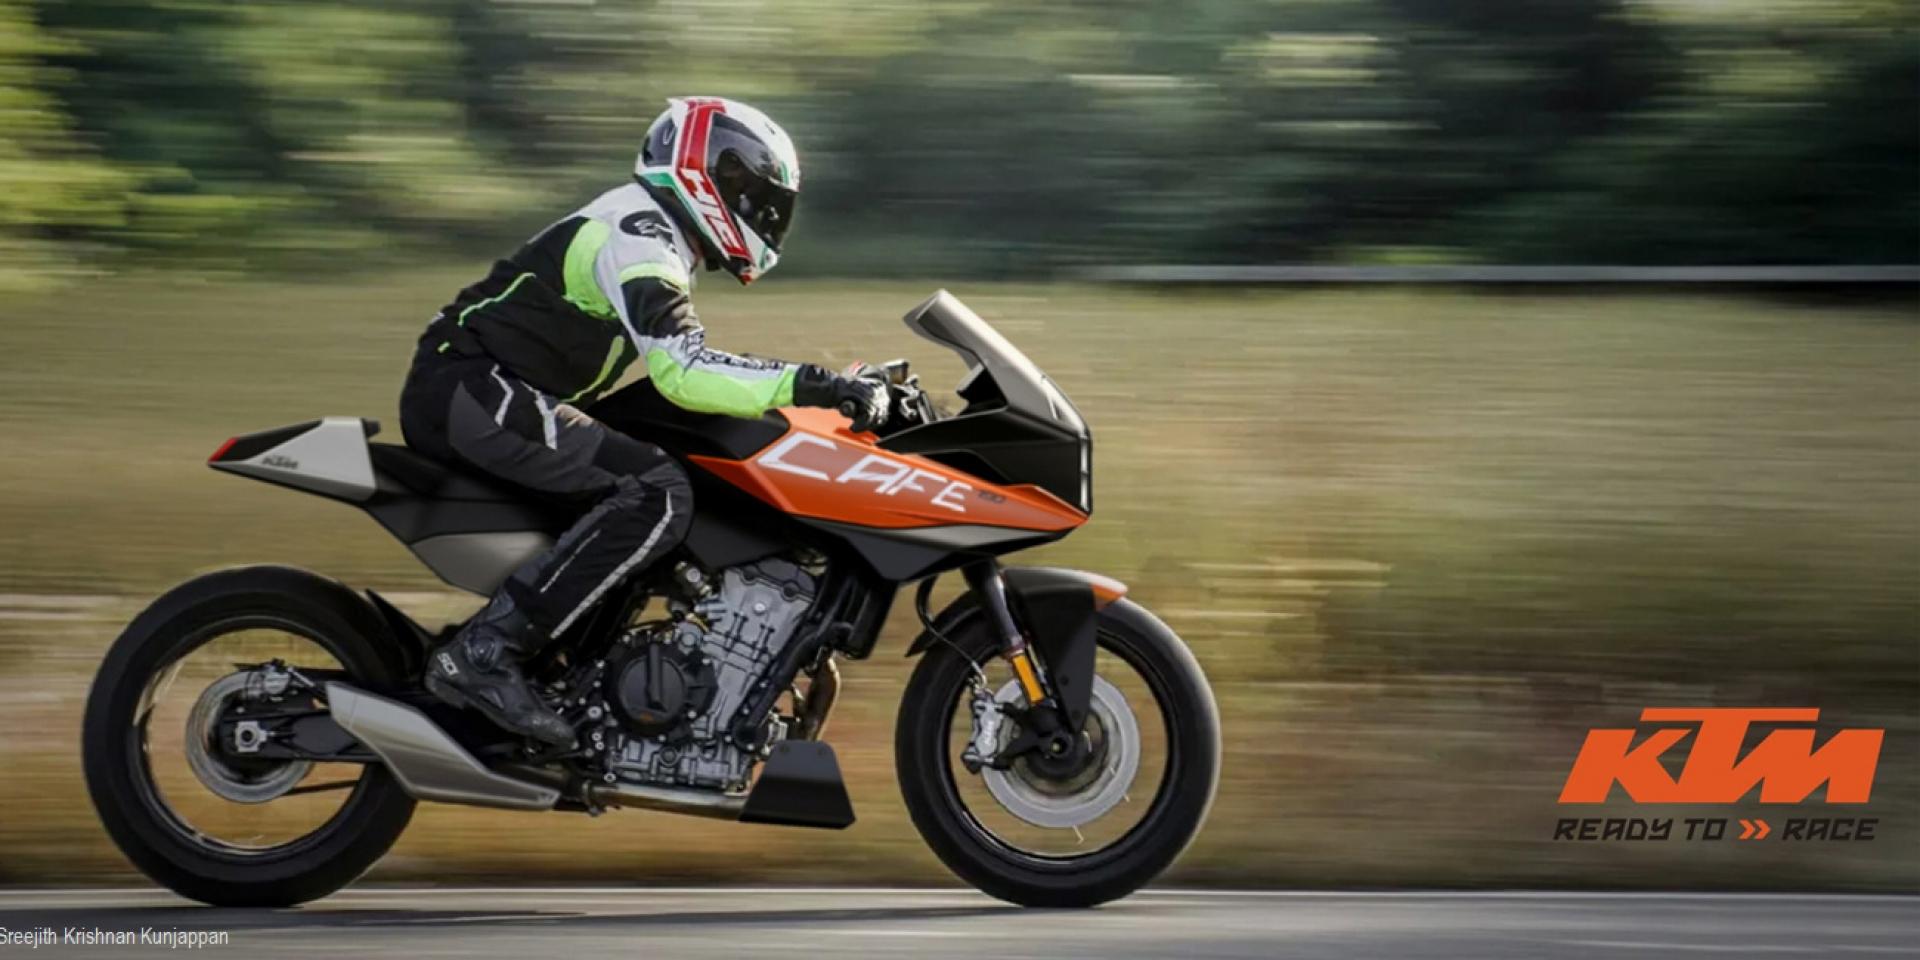 直二公爵喝咖啡。KTM 790「Cafe Racer Concept」by.Sreejith Krishnan Kunjappan